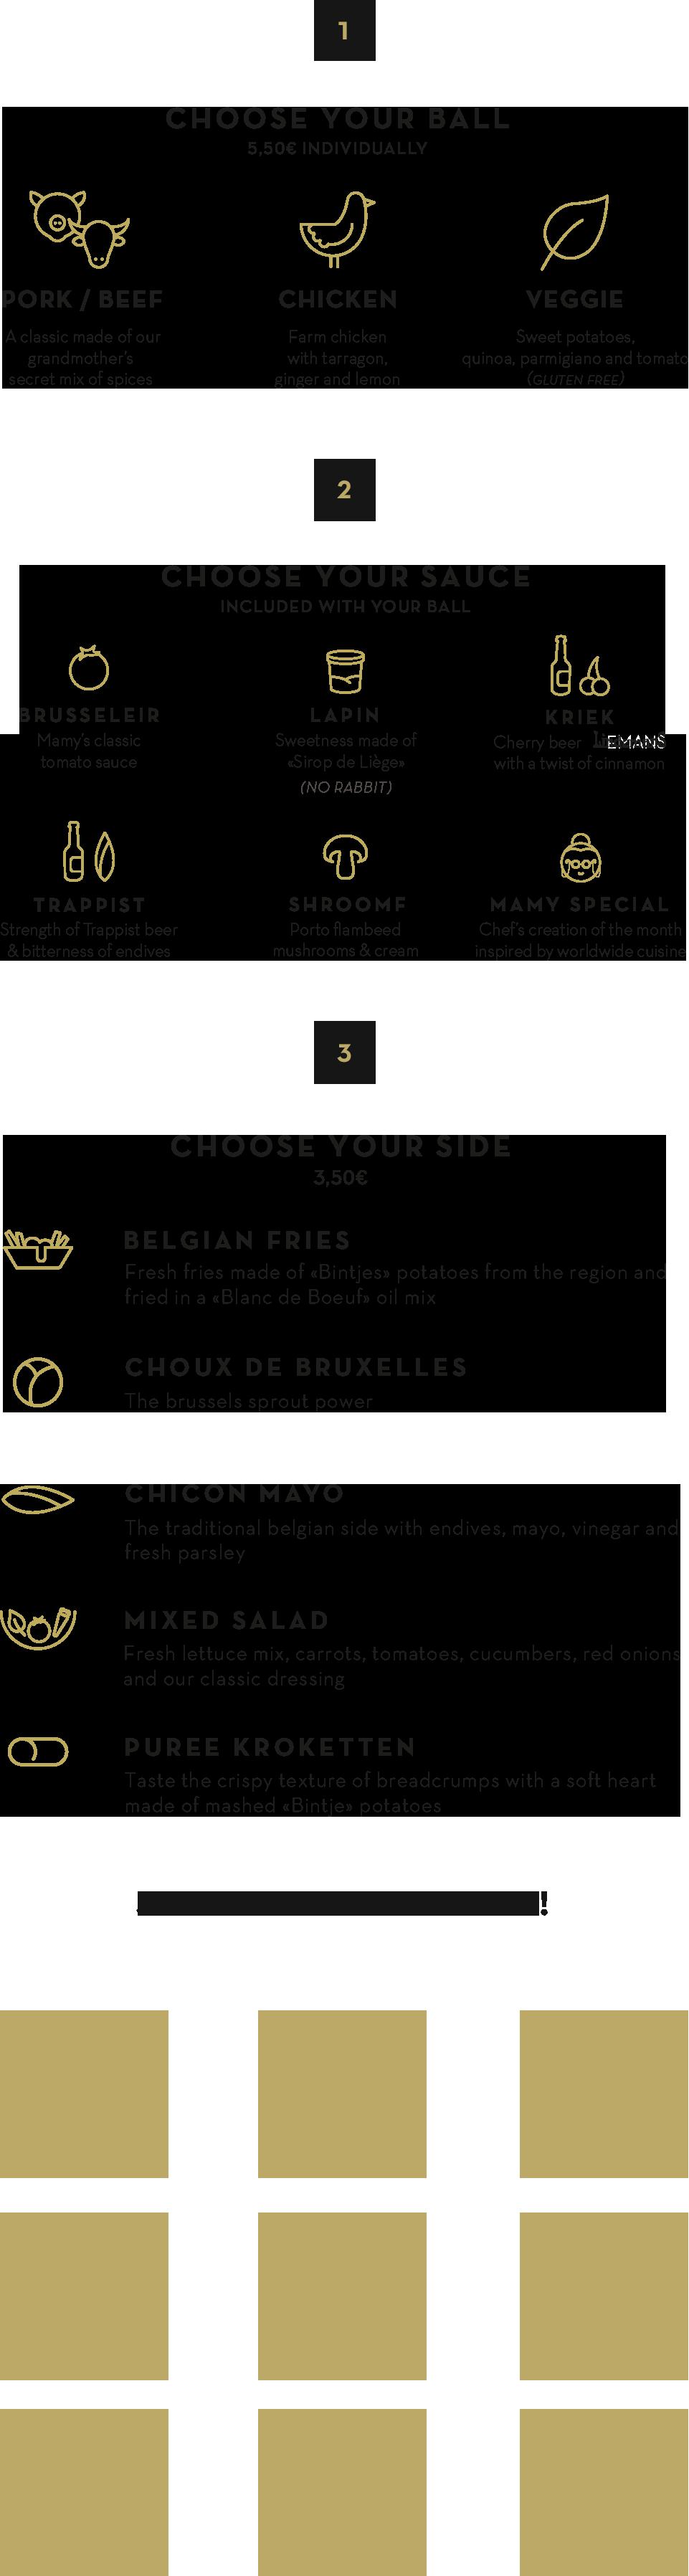 ballekes-menu-steps